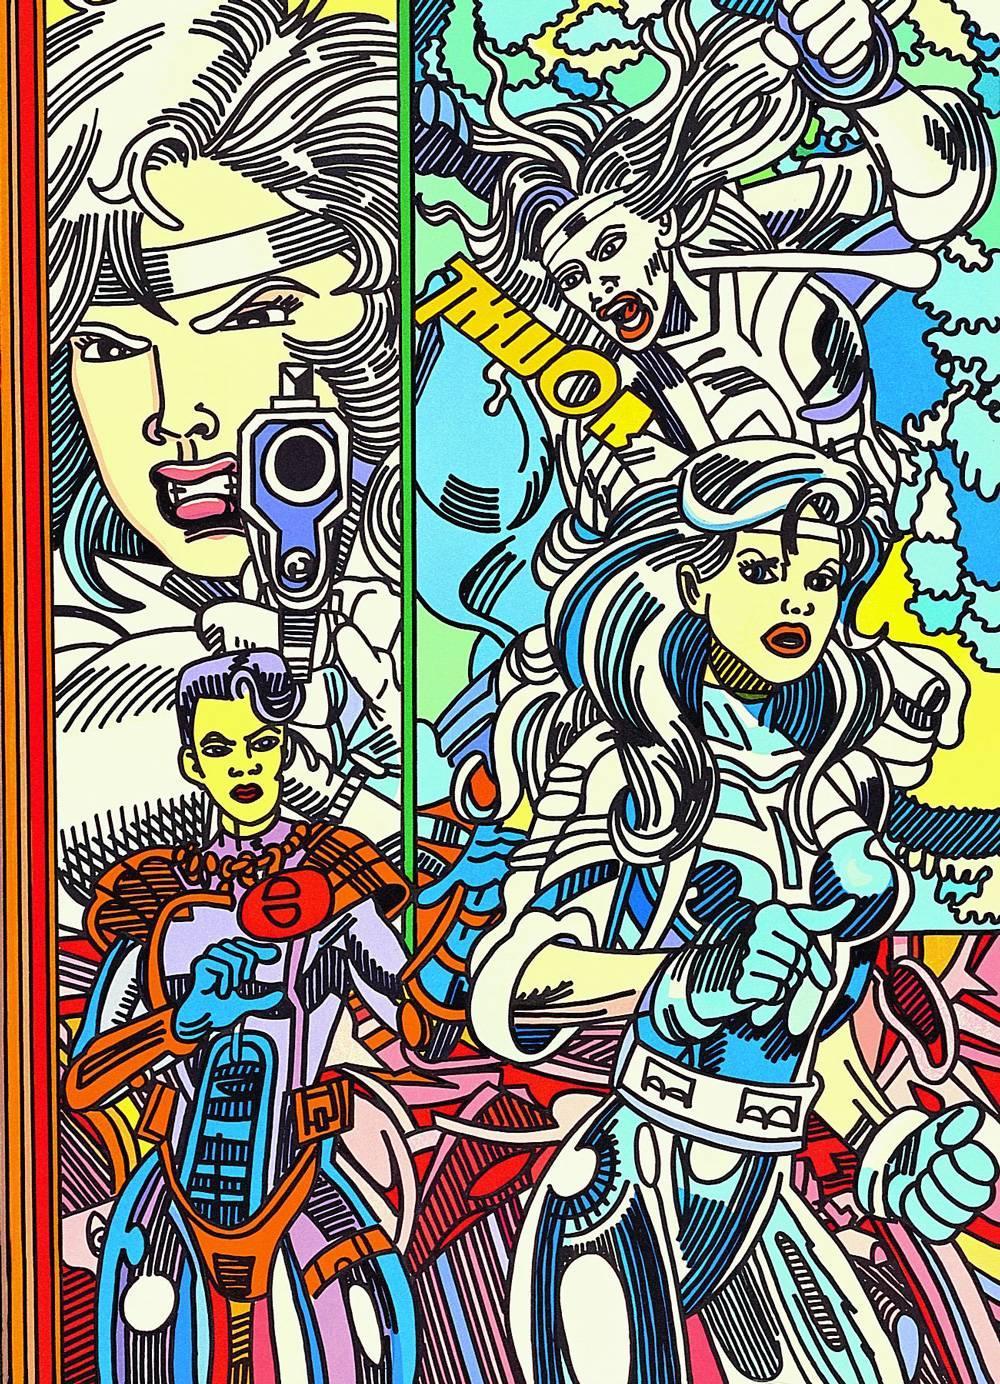 Silver Sabler, Pop Art, Contemporary Art